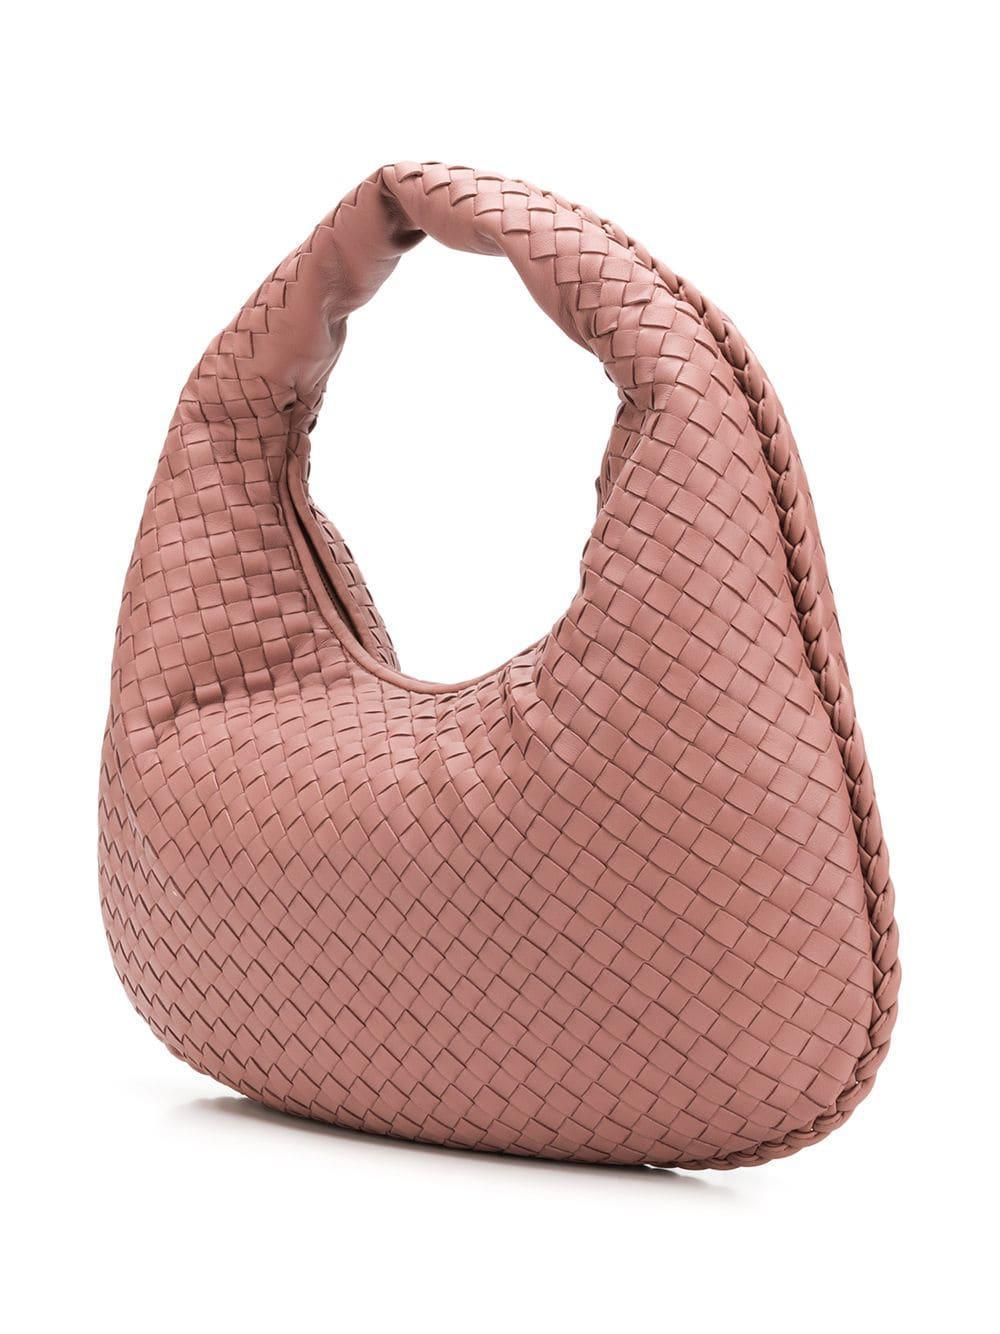 3c72d51bc8dd Lyst - Bottega Veneta Medium Veneta Bag in Pink